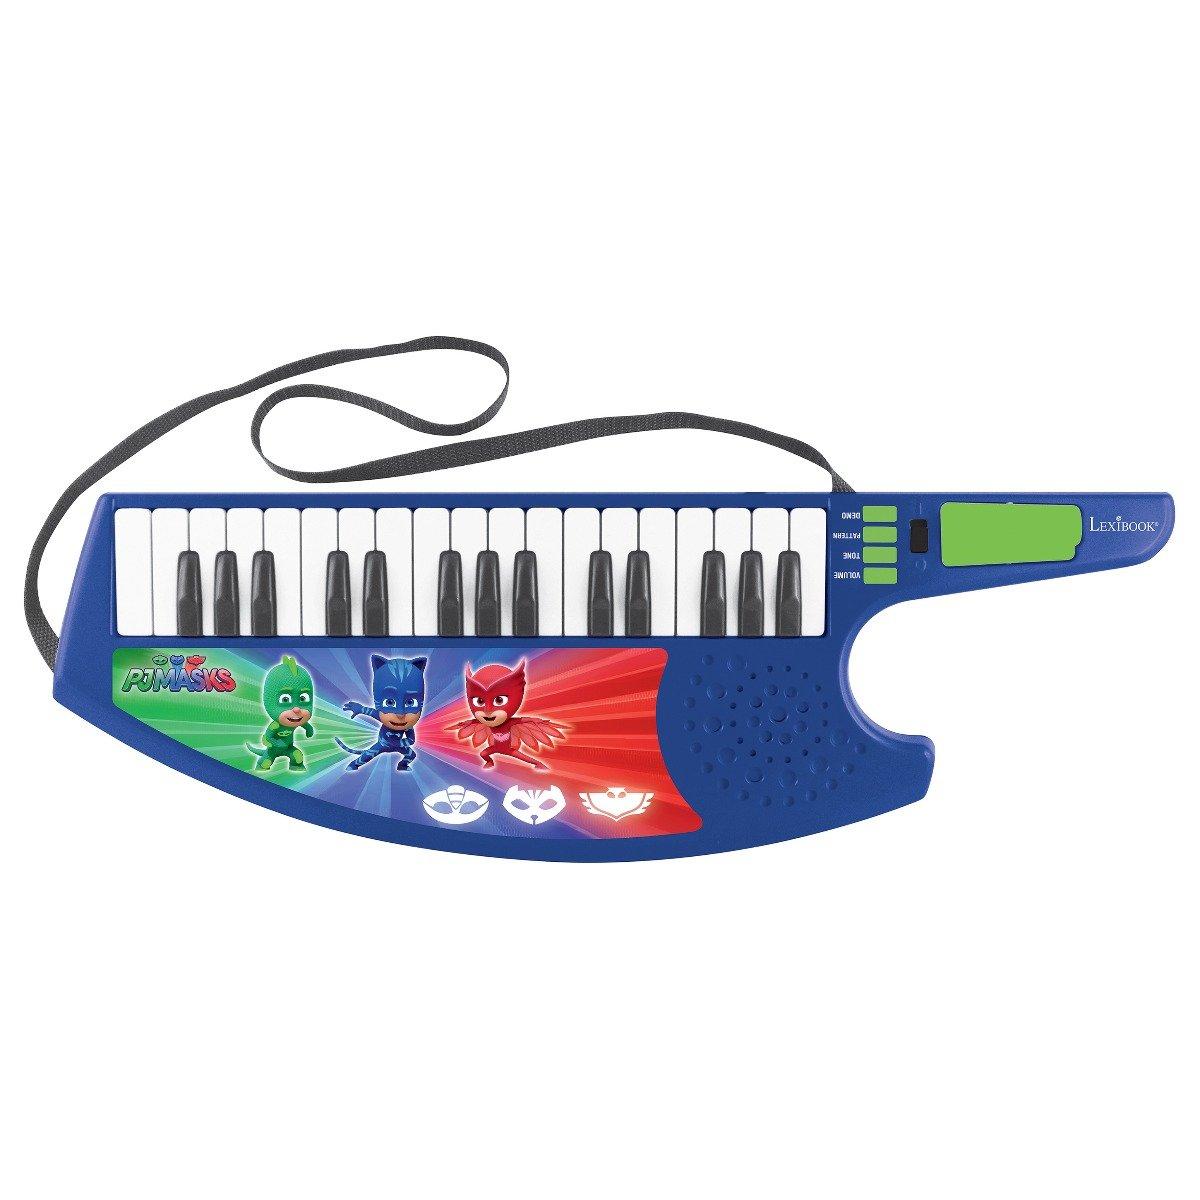 Orga electronica in forma de chitara, Pj Masks